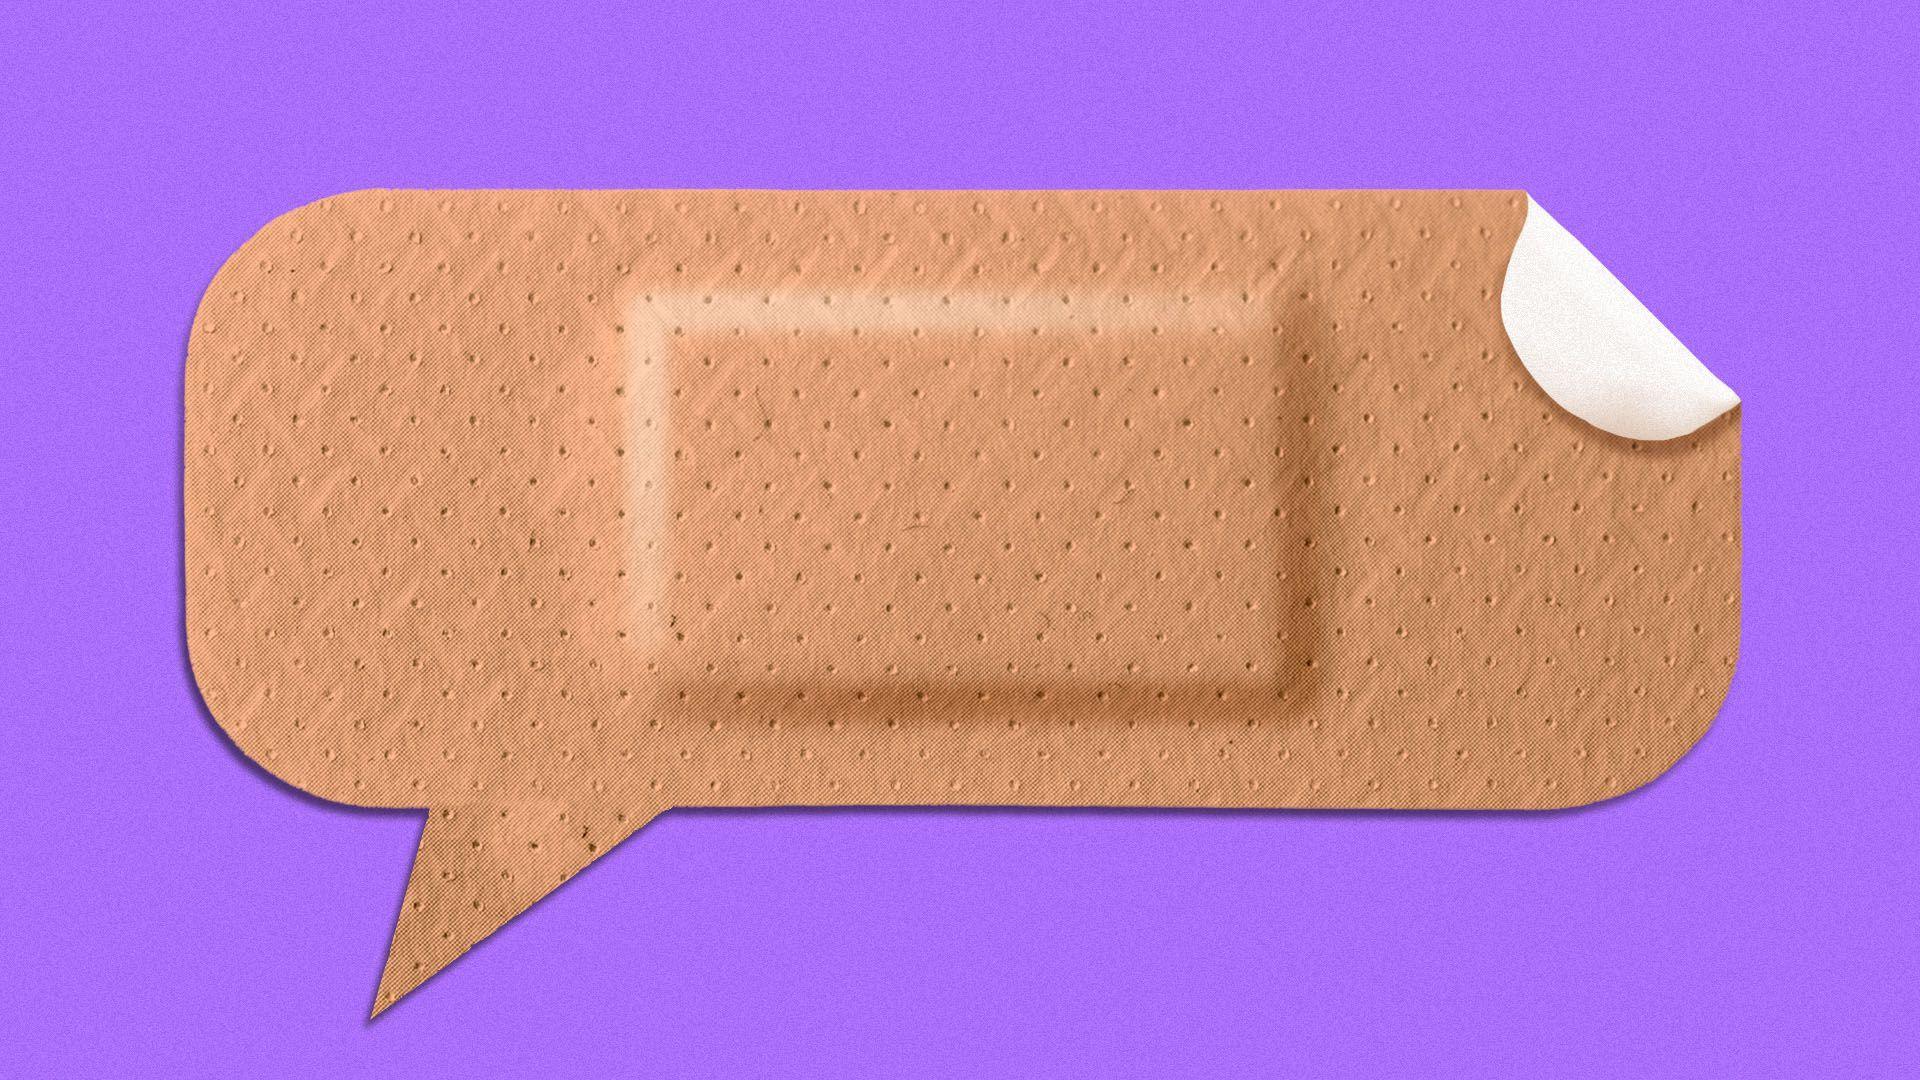 Illustration of a band aid shaped like a speech bubble